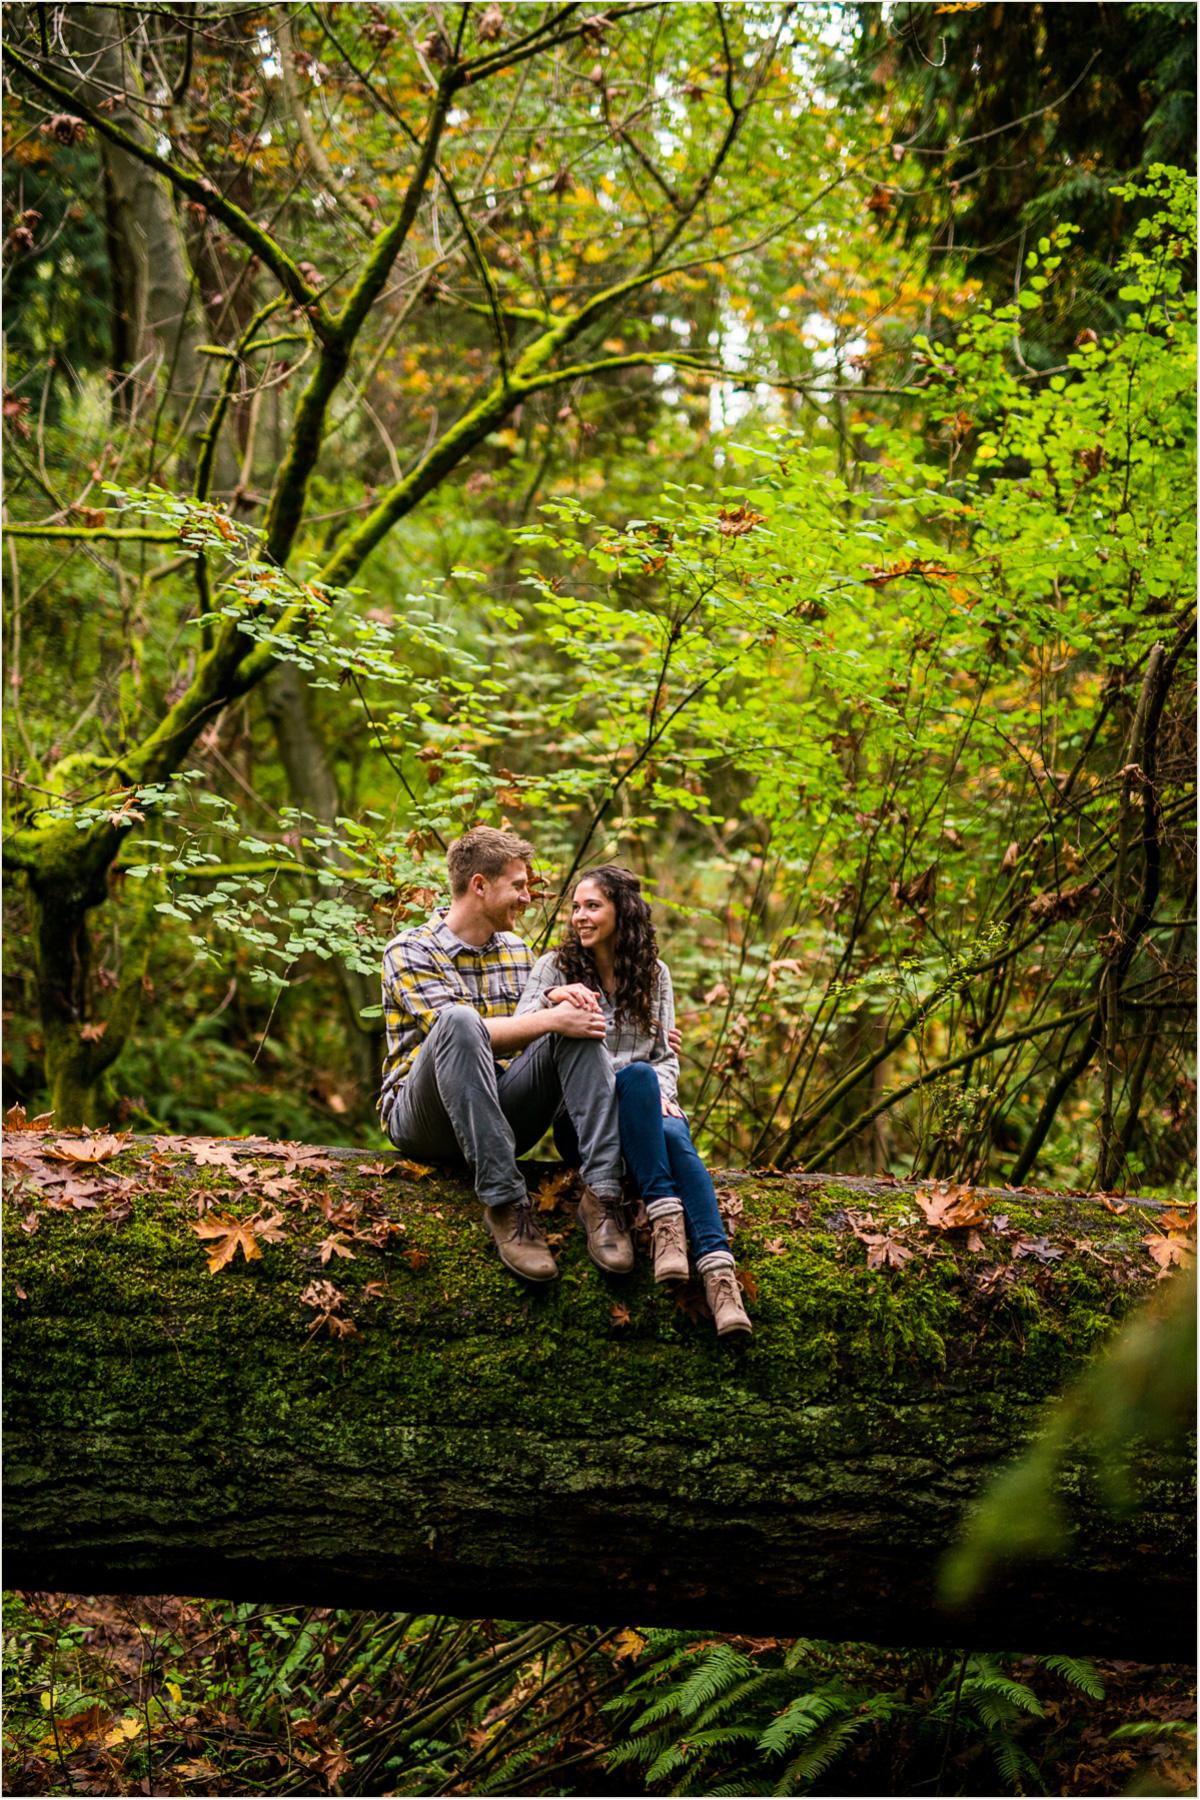 Schmitz Park Engagement Photos